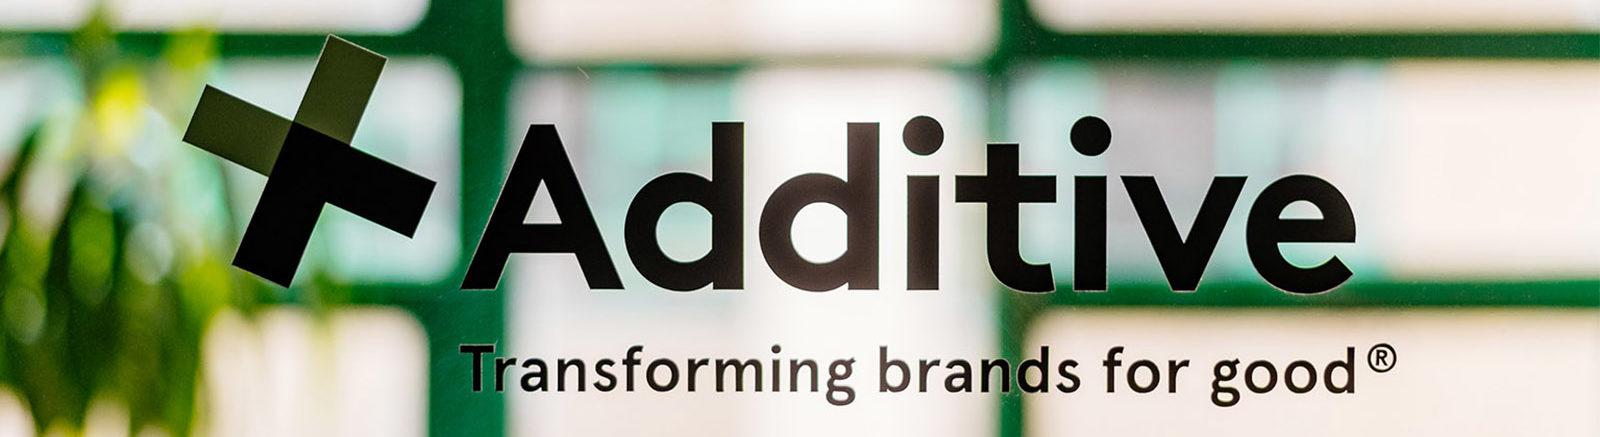 Additive-academy_01